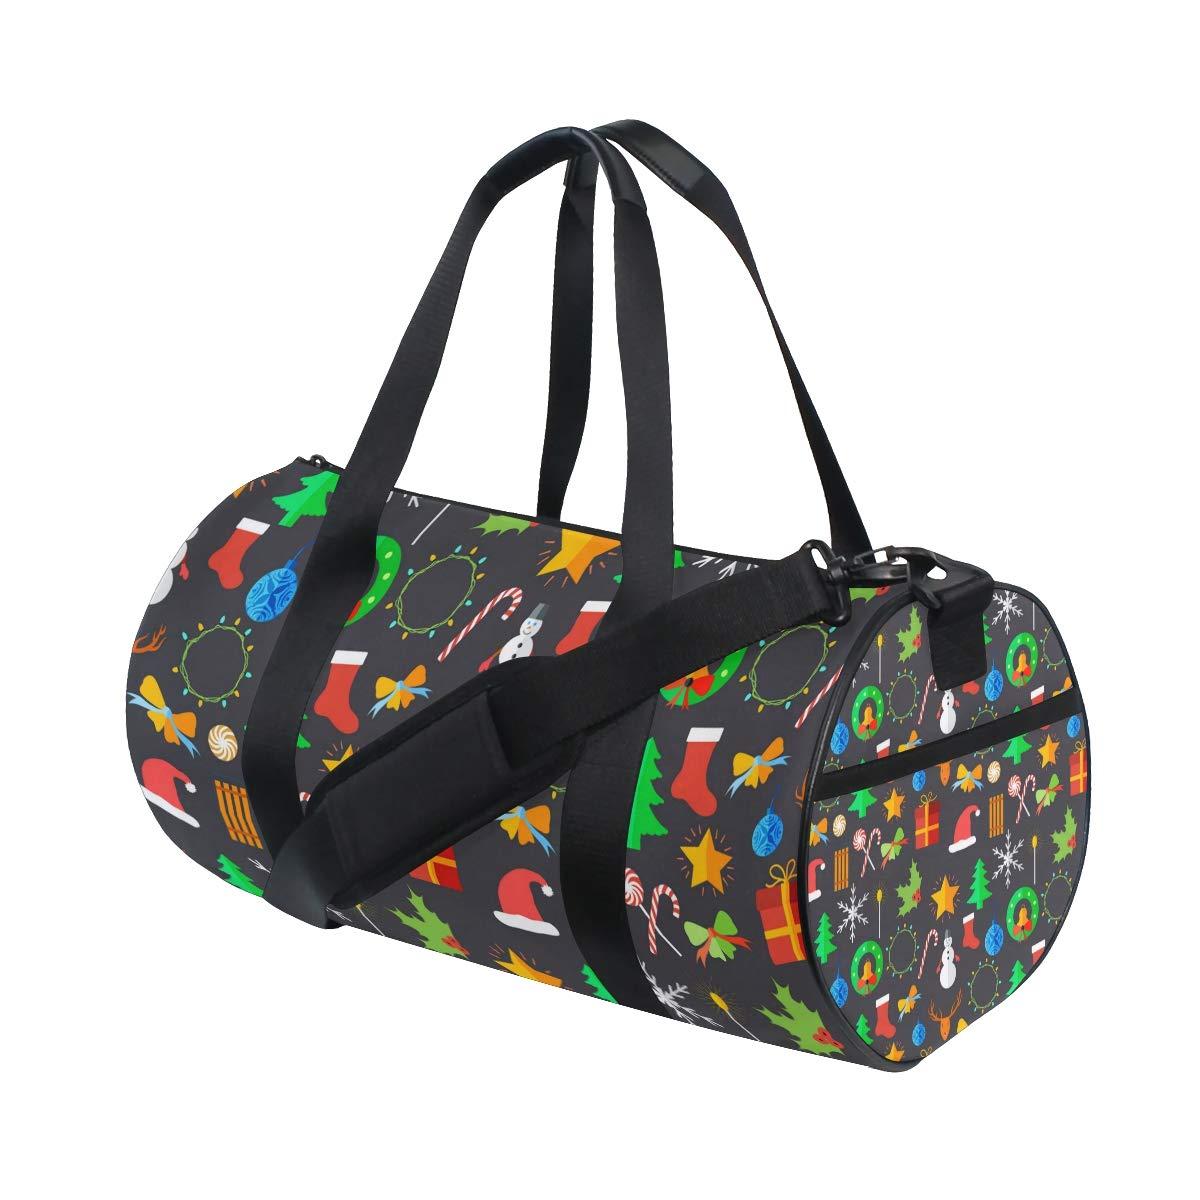 Waterproof Shoulder Bag. Good Bells Christmas Decorations Popular casual fitness bag,Non-Slip Wearable Crossbody Bag